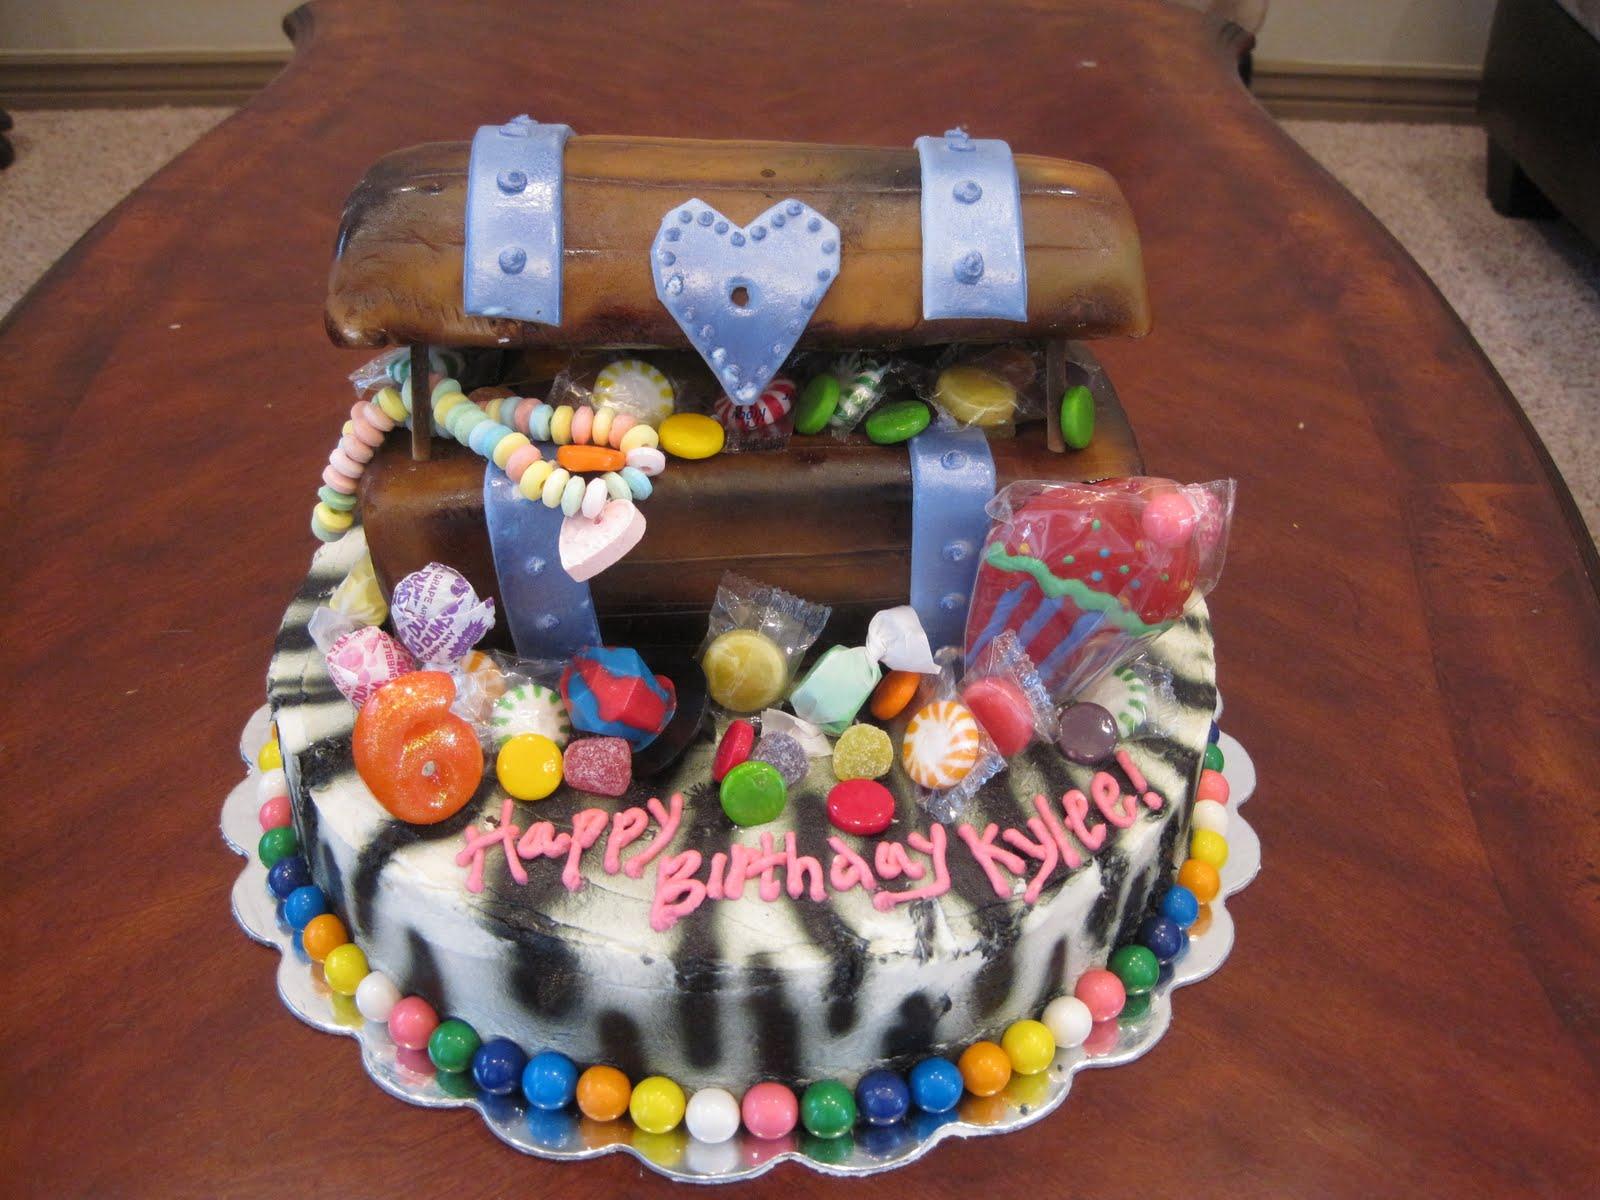 Megans Creations Zebra Pirate Candyland Birthday Cake